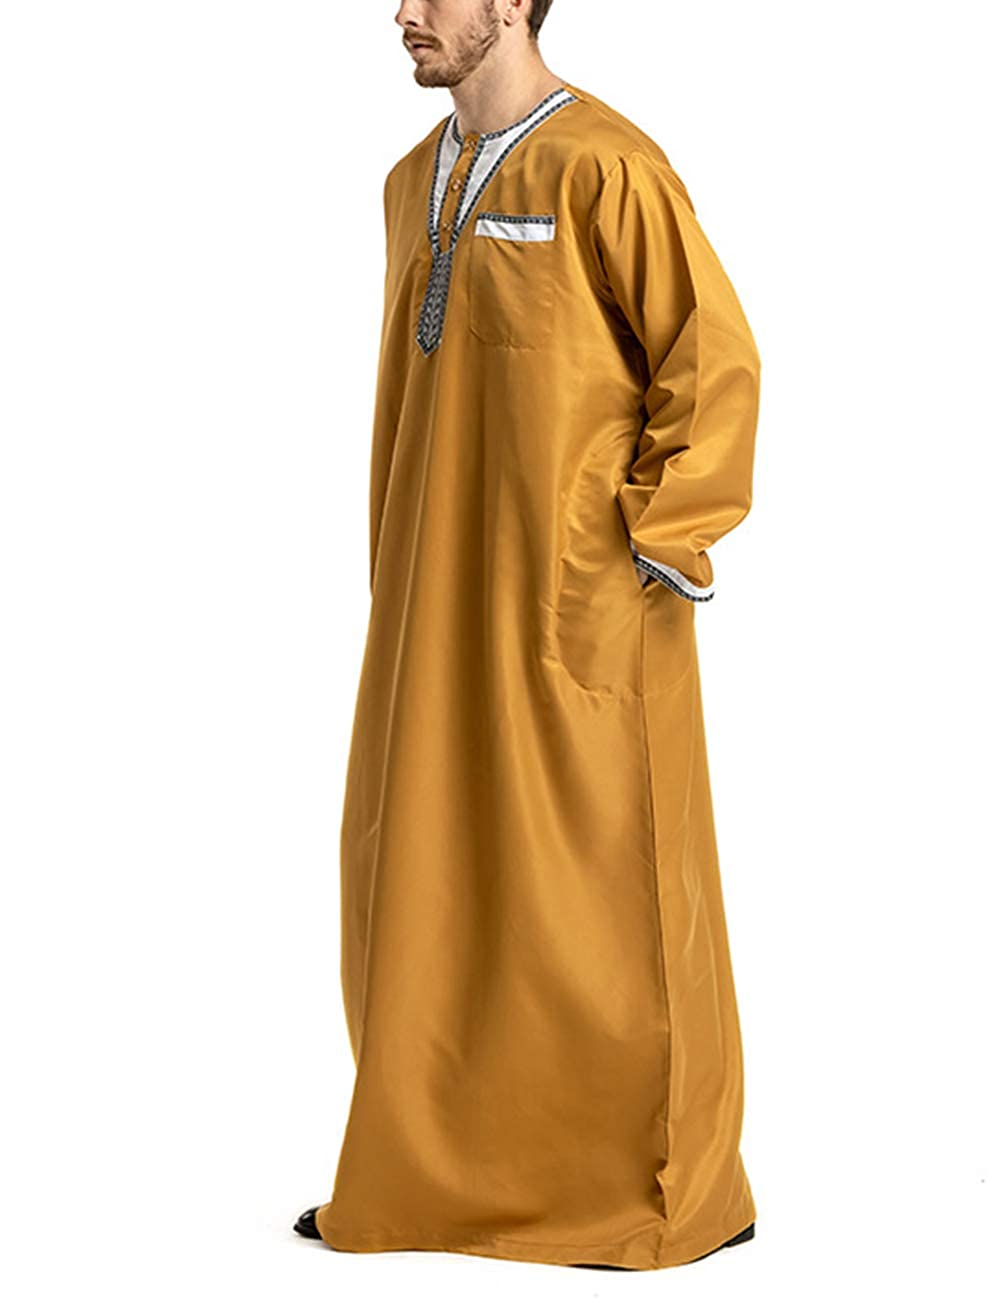 Zhhlaixing Abbigliamento da Uomo Musulmano Girocollo Manica Lunga Thobe Arabo Saudita Solido Abito Islamico di Dubai per Un Matrimonio Kaftan Jalabiya Caftan